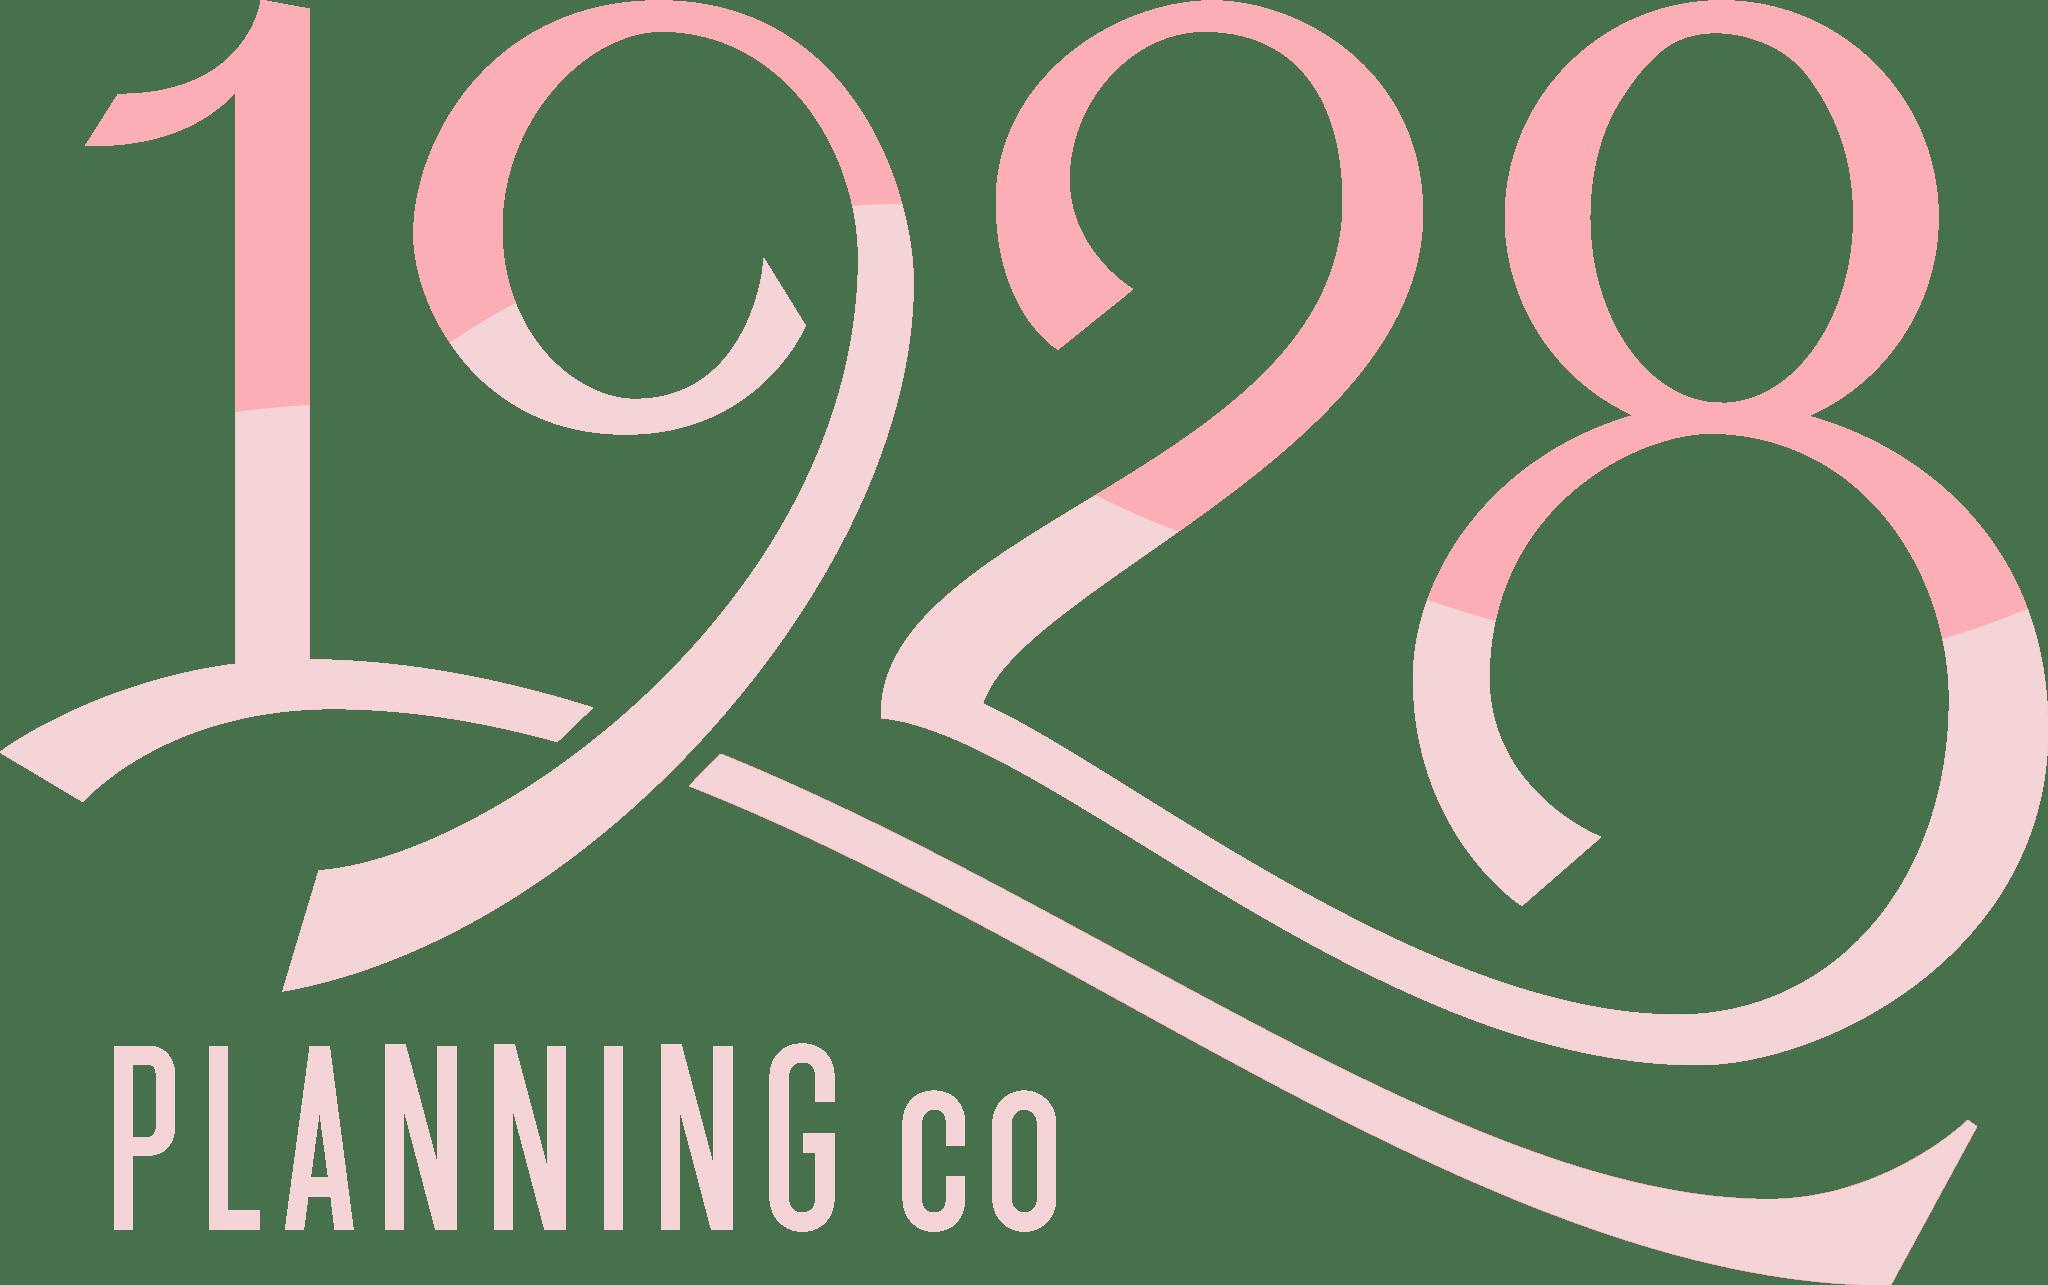 Southwest Michigan Wedding Planners 1928 Planning Co